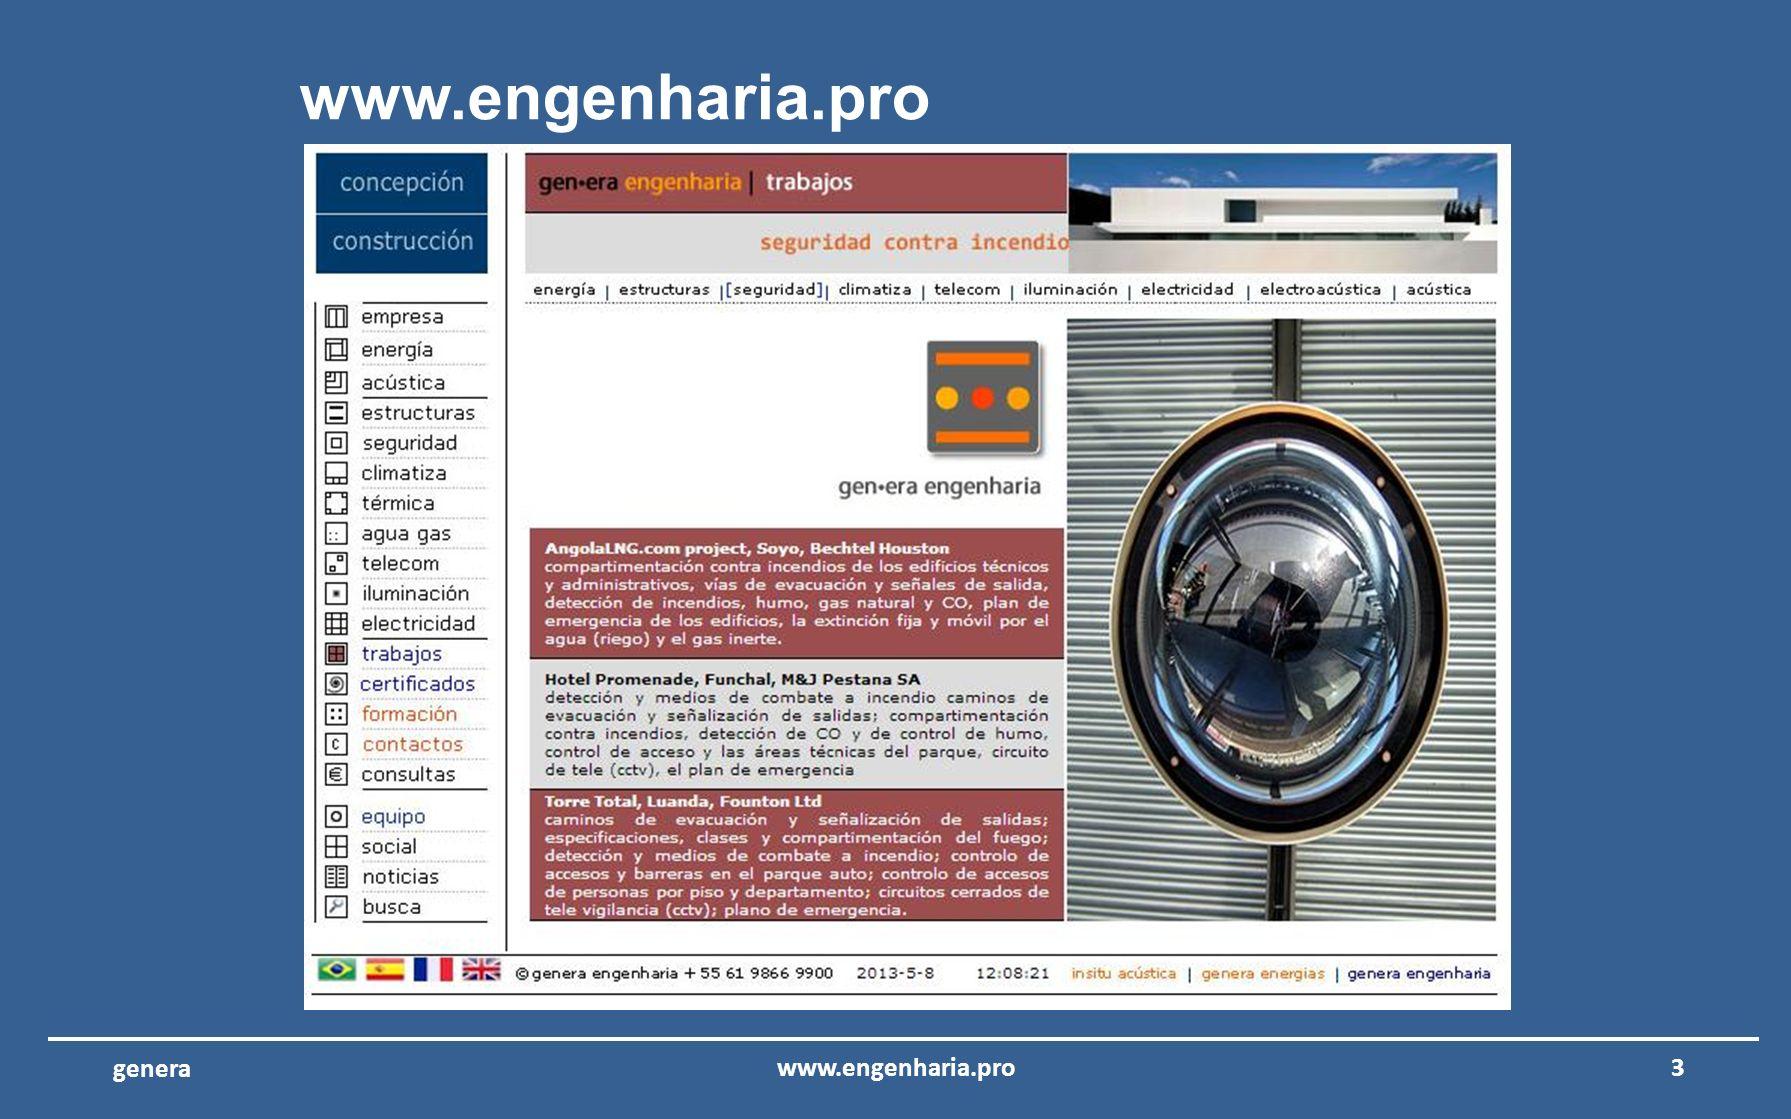 www.engenharia.pro 3www.engenharia.pro genera